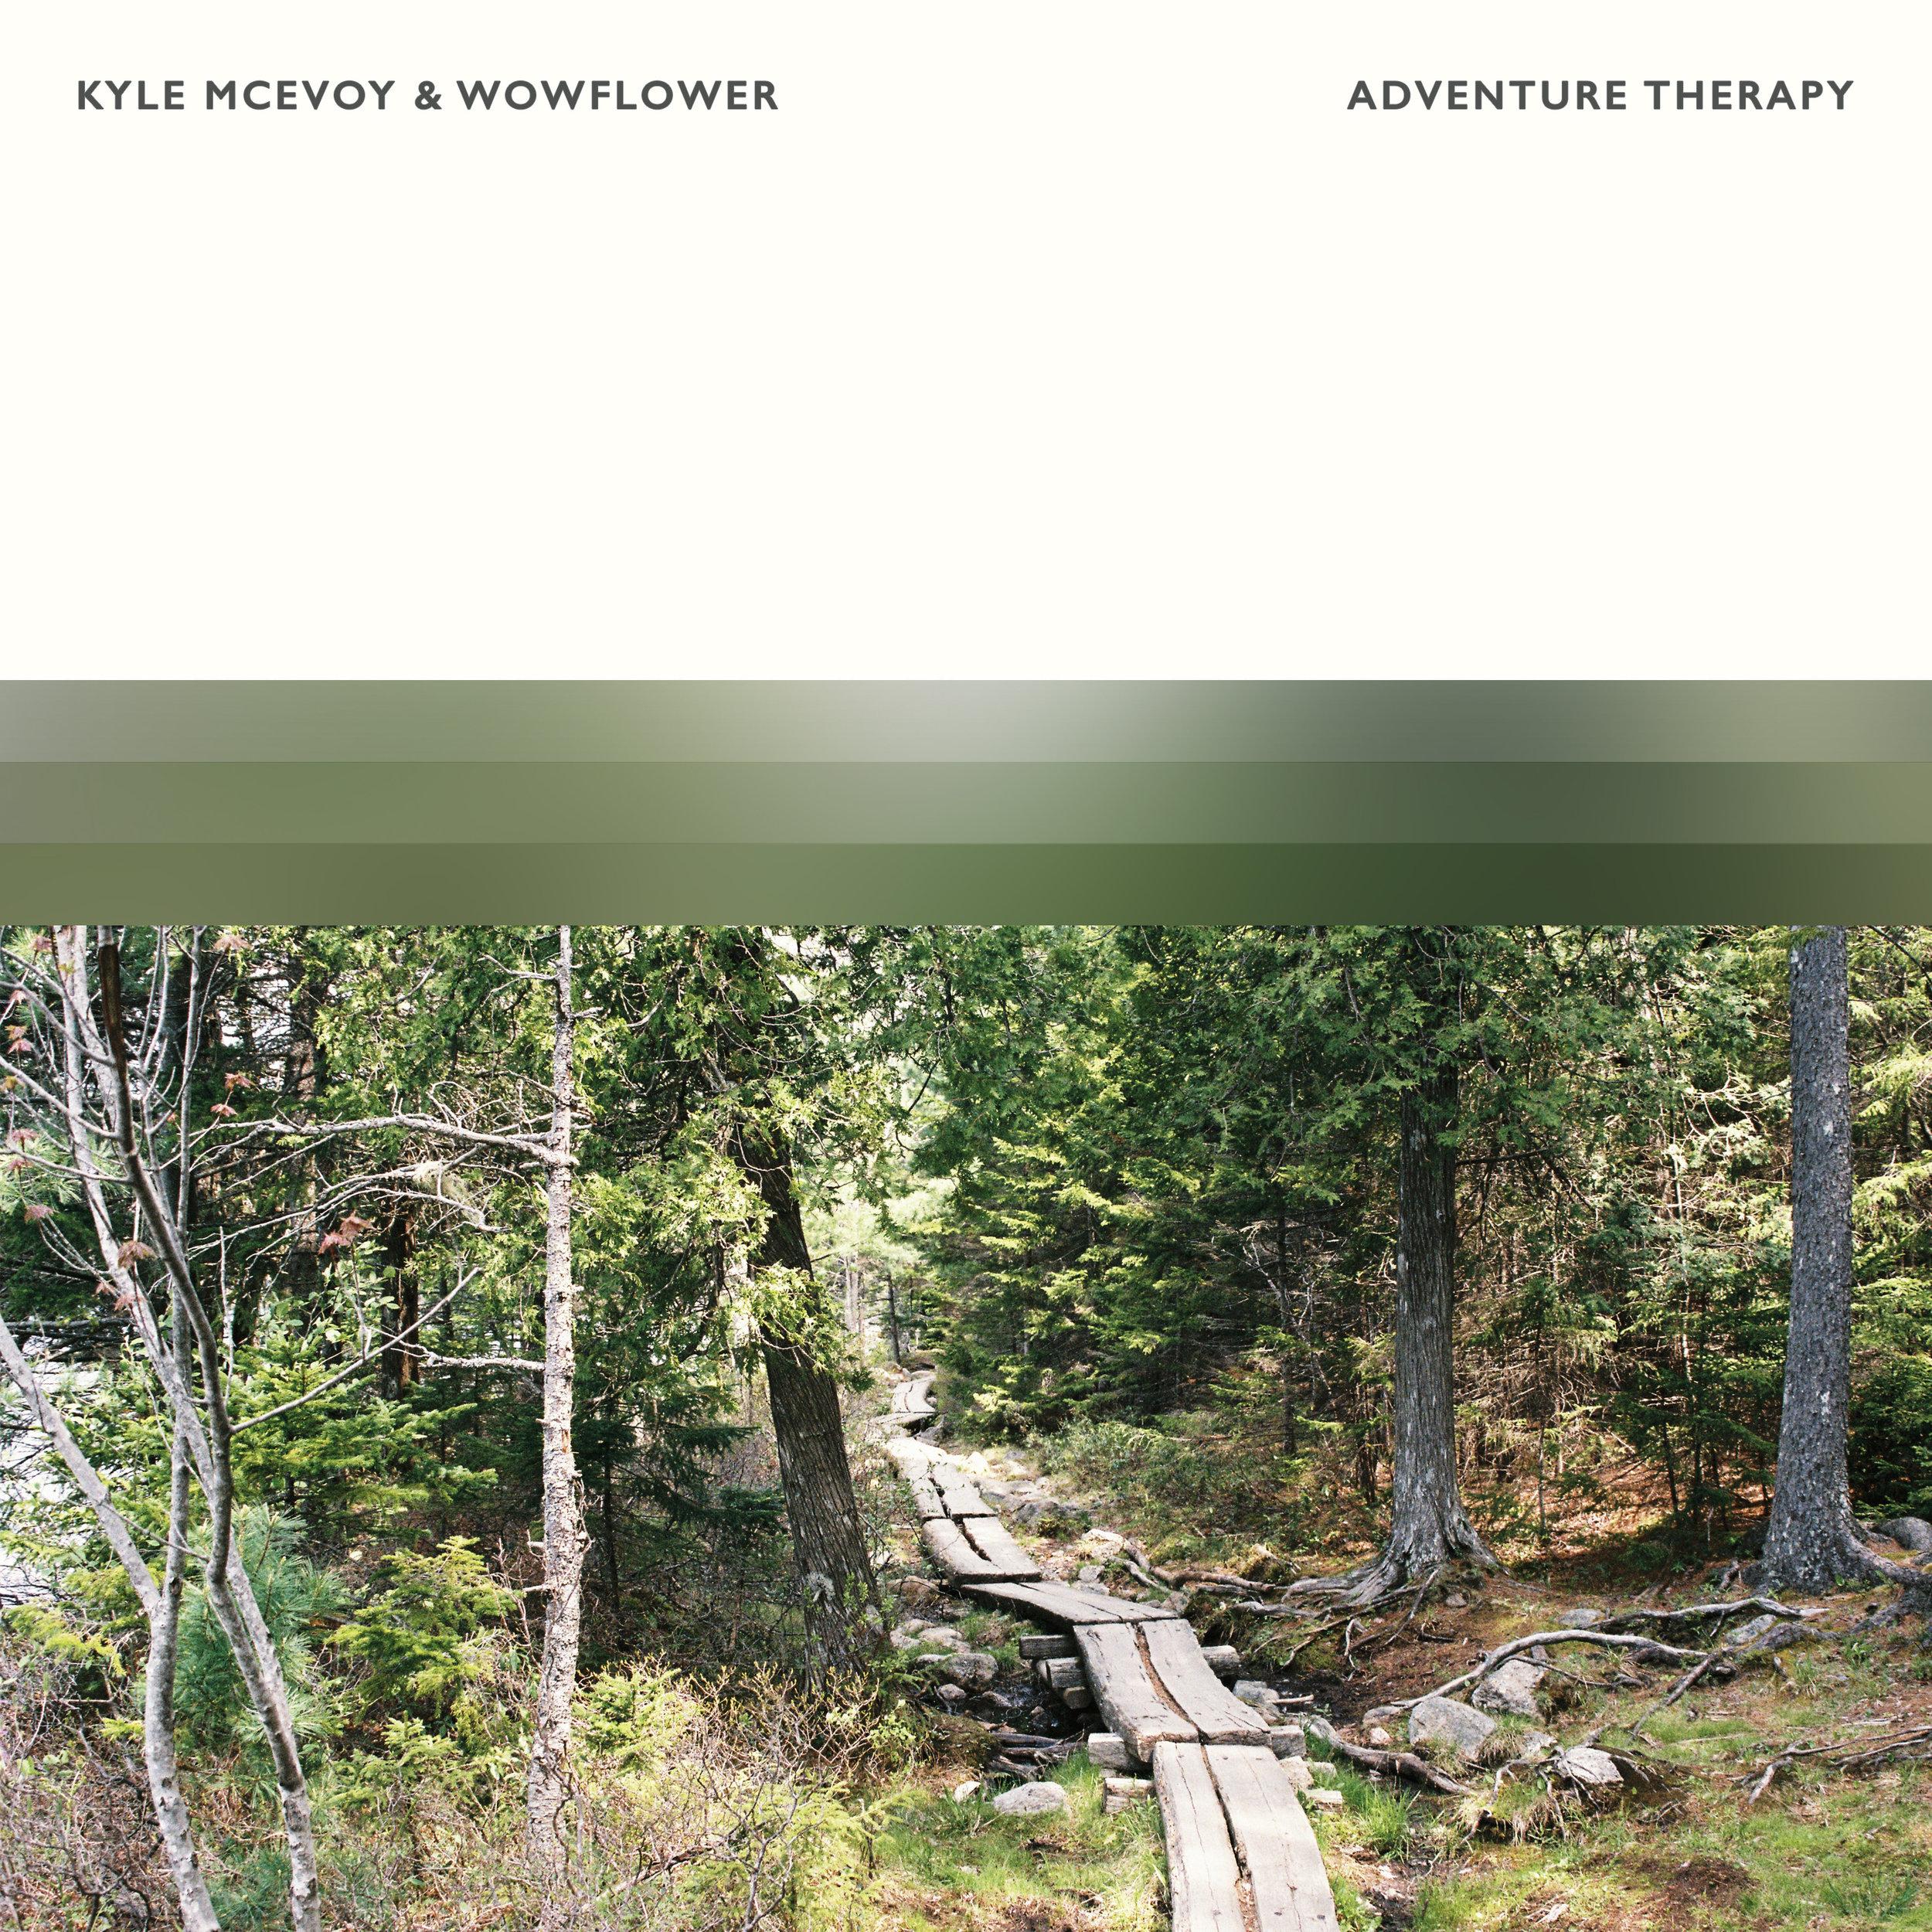 Kyle McEvoy - Adventure Therapy